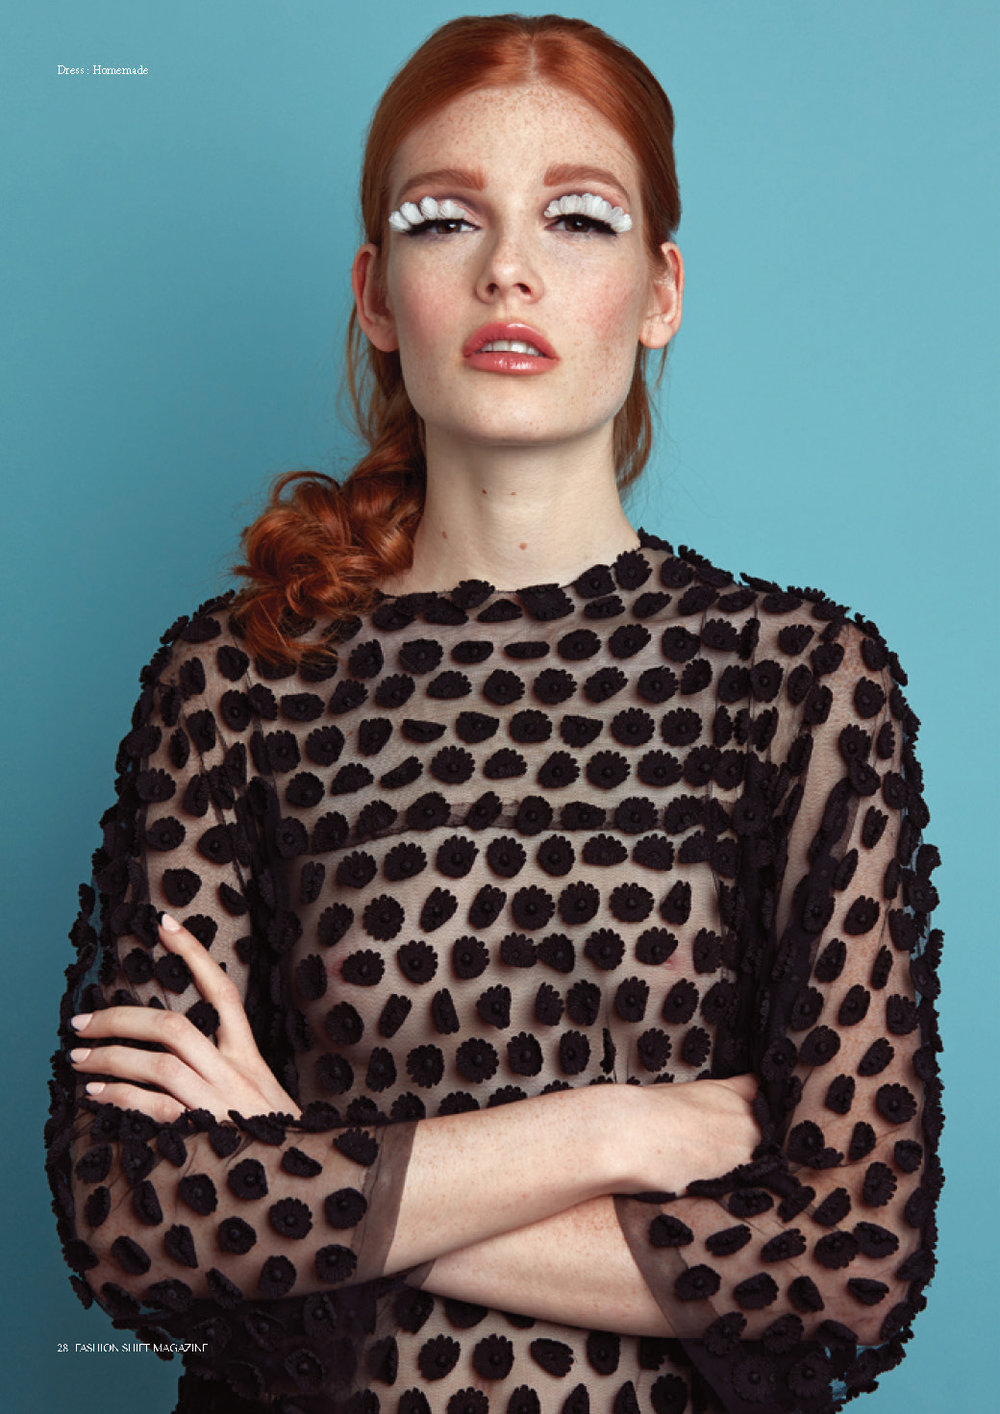 BSCC_Emilie+Tournevache_Fashion+Photographer.jpg